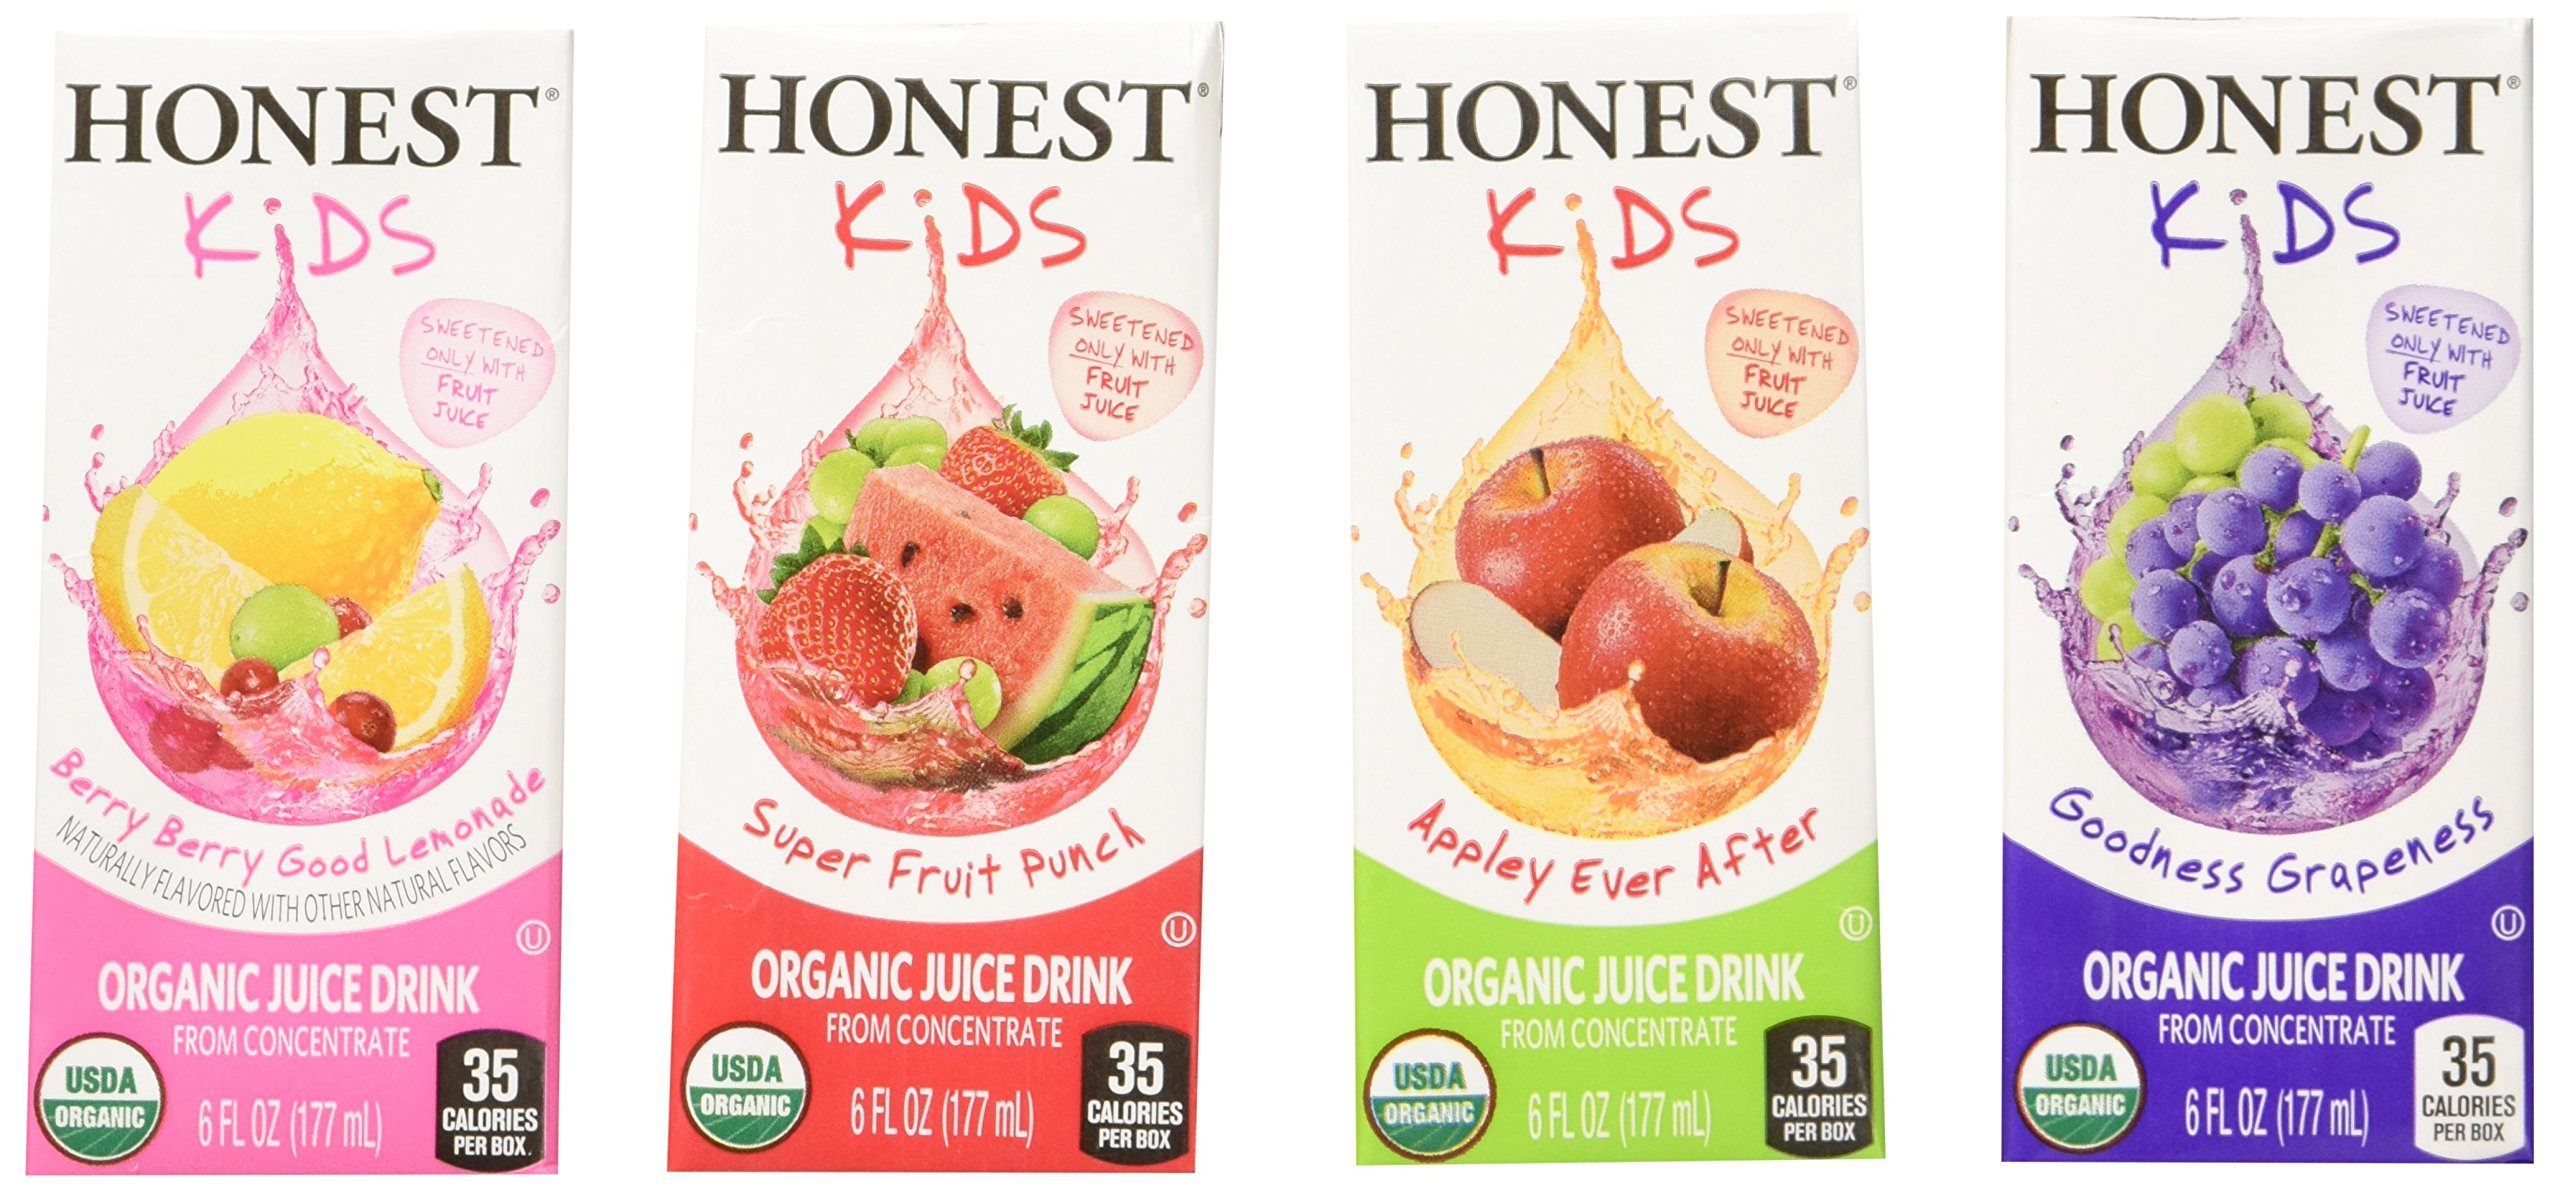 Honest Kids Organic Fruit Juice Drink Boxes, Assorted Flavors, 329.34 oz